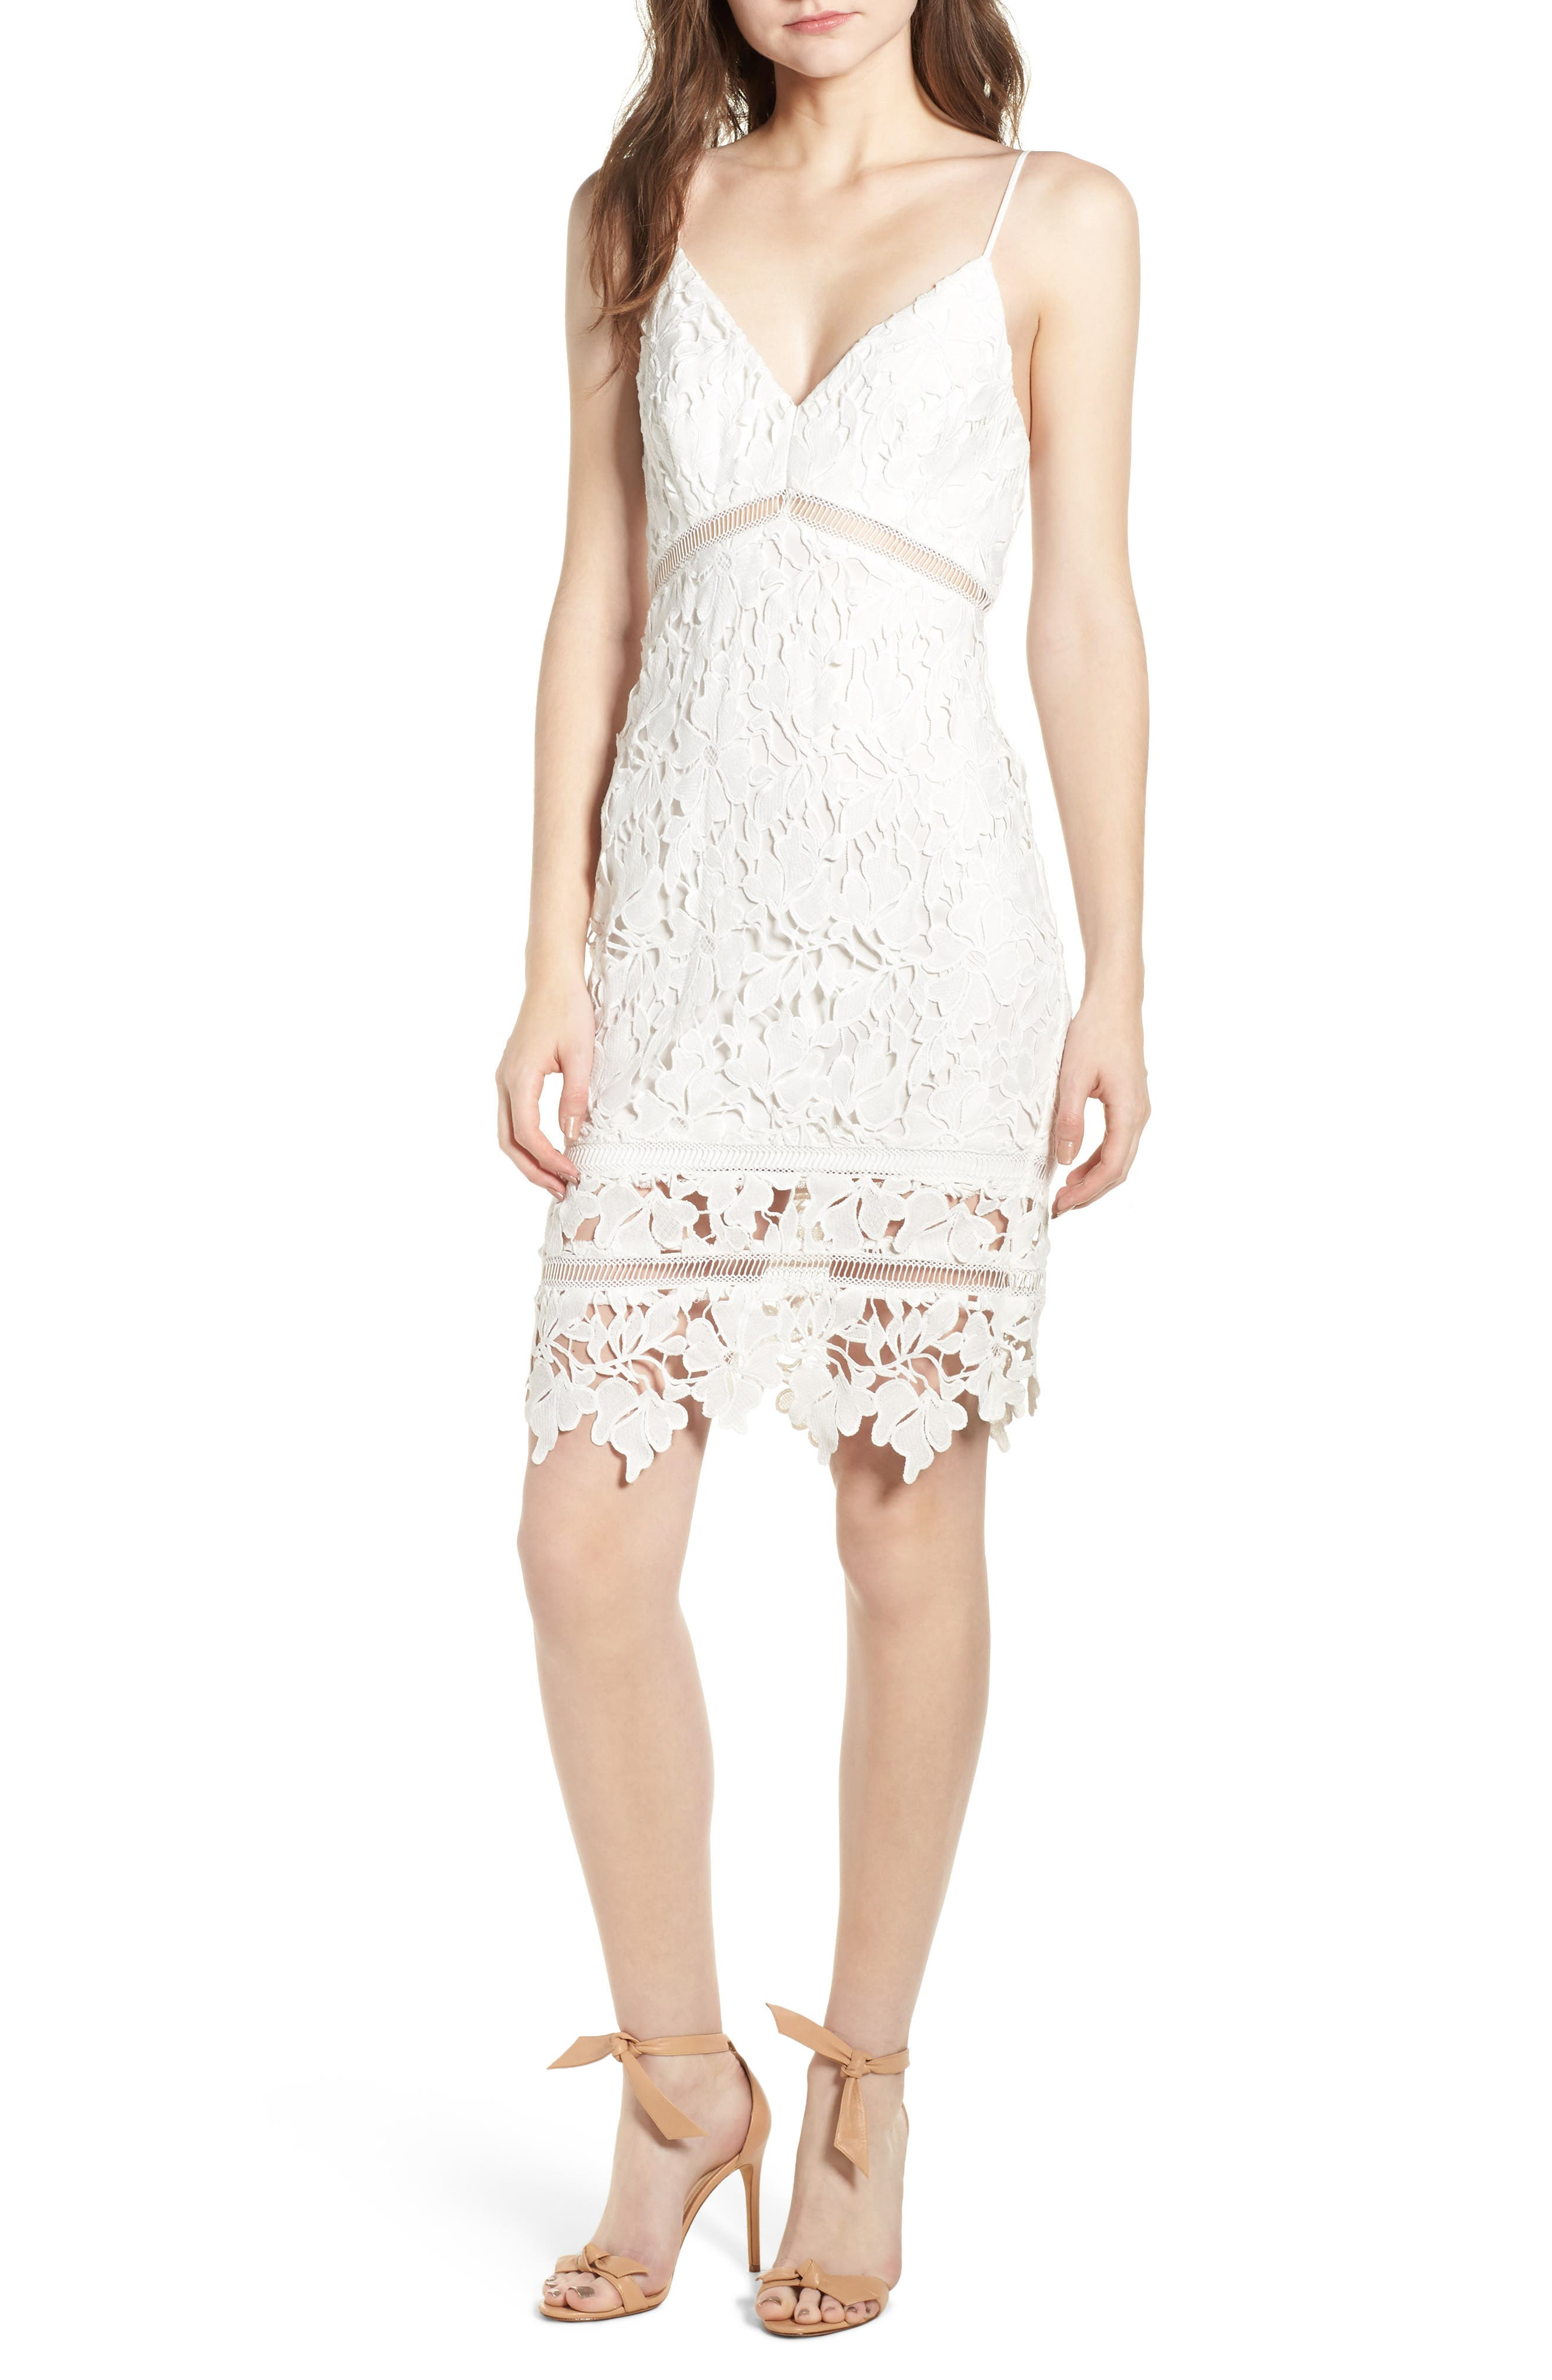 ASTR THE LABEL, ASTR Lace Bodycon Dress, Main thumbnail 1, color, WHITE